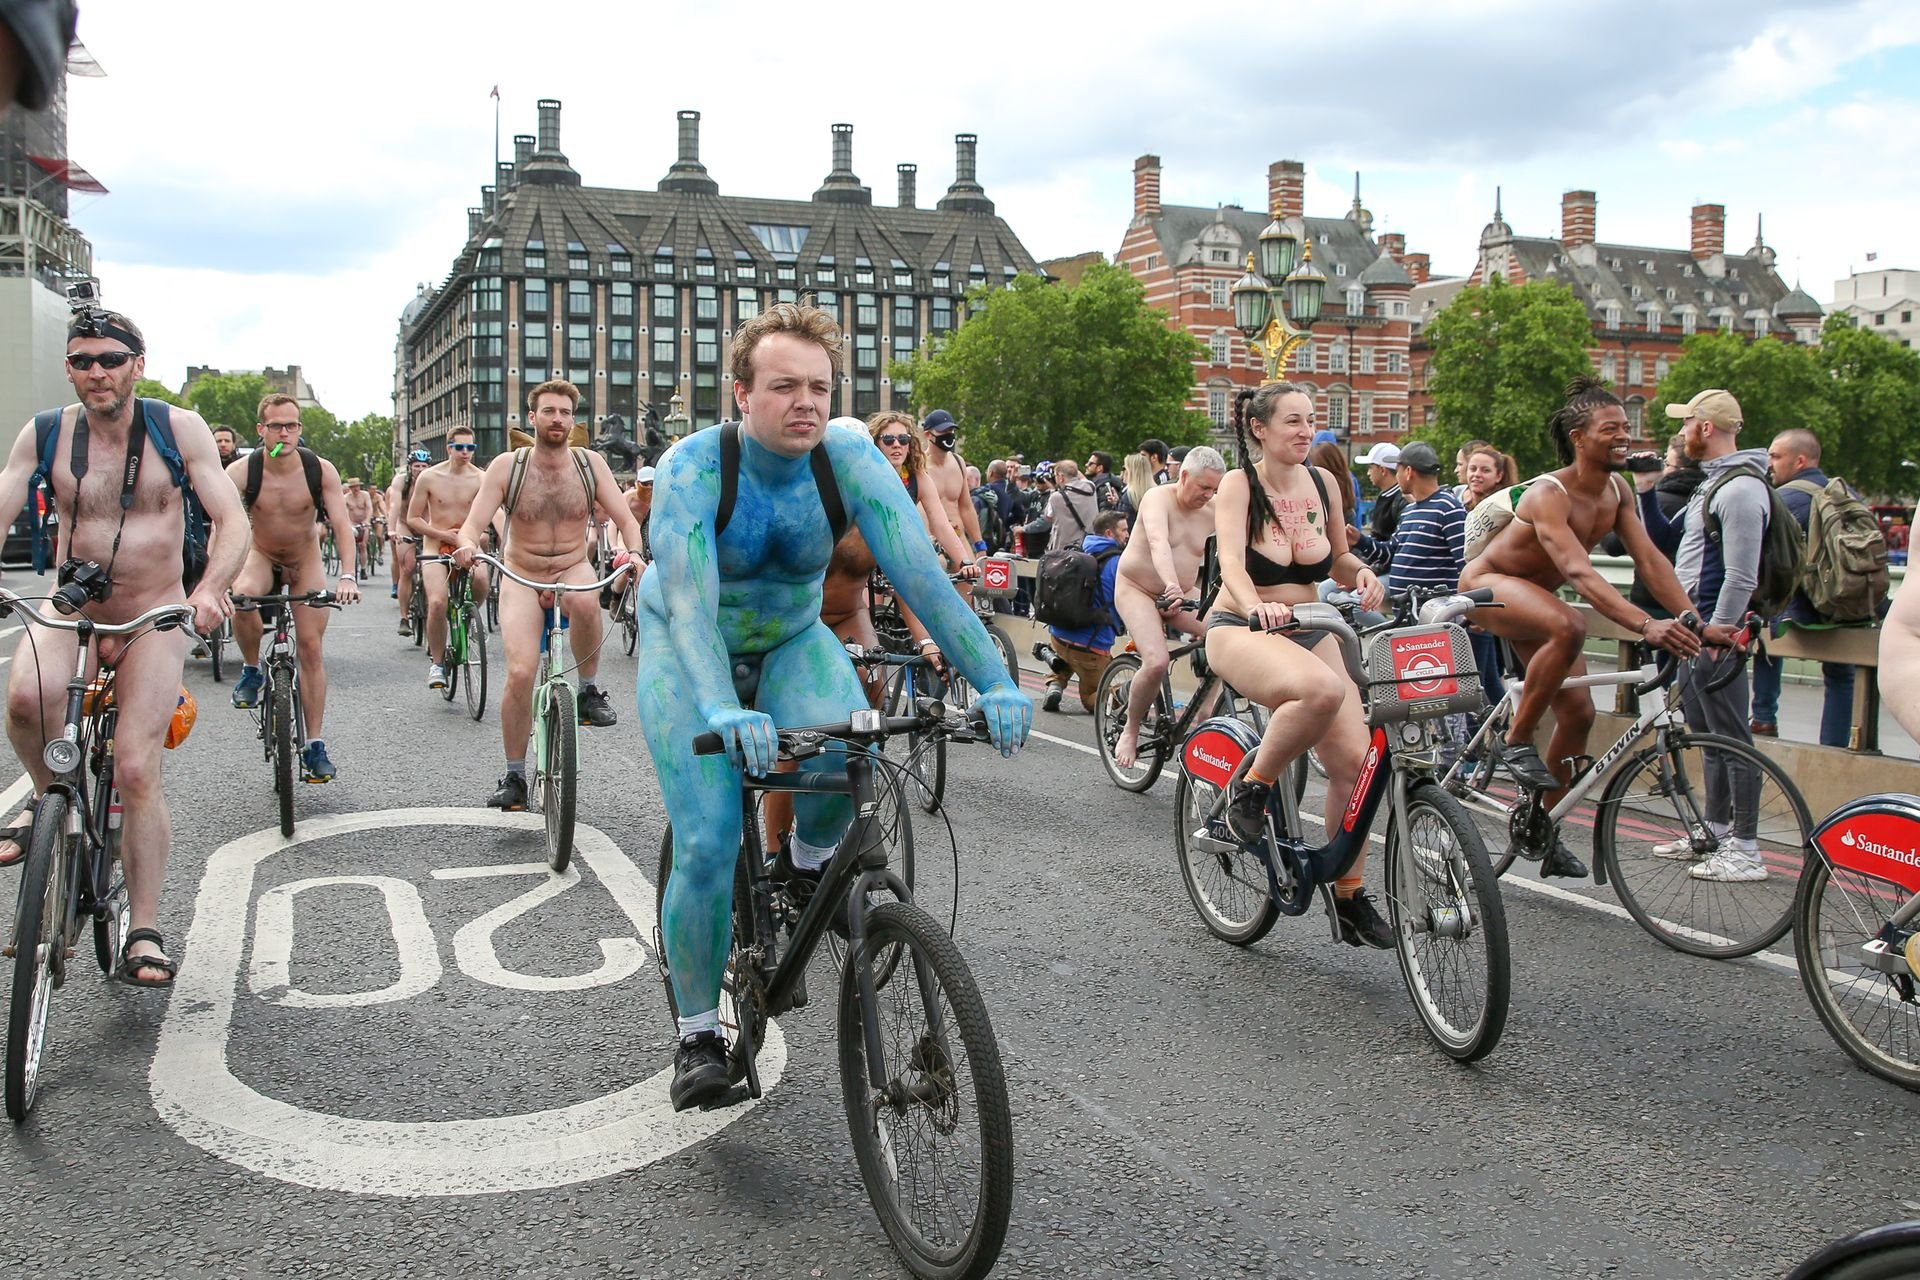 Hot Bike London Nude Ride Pics